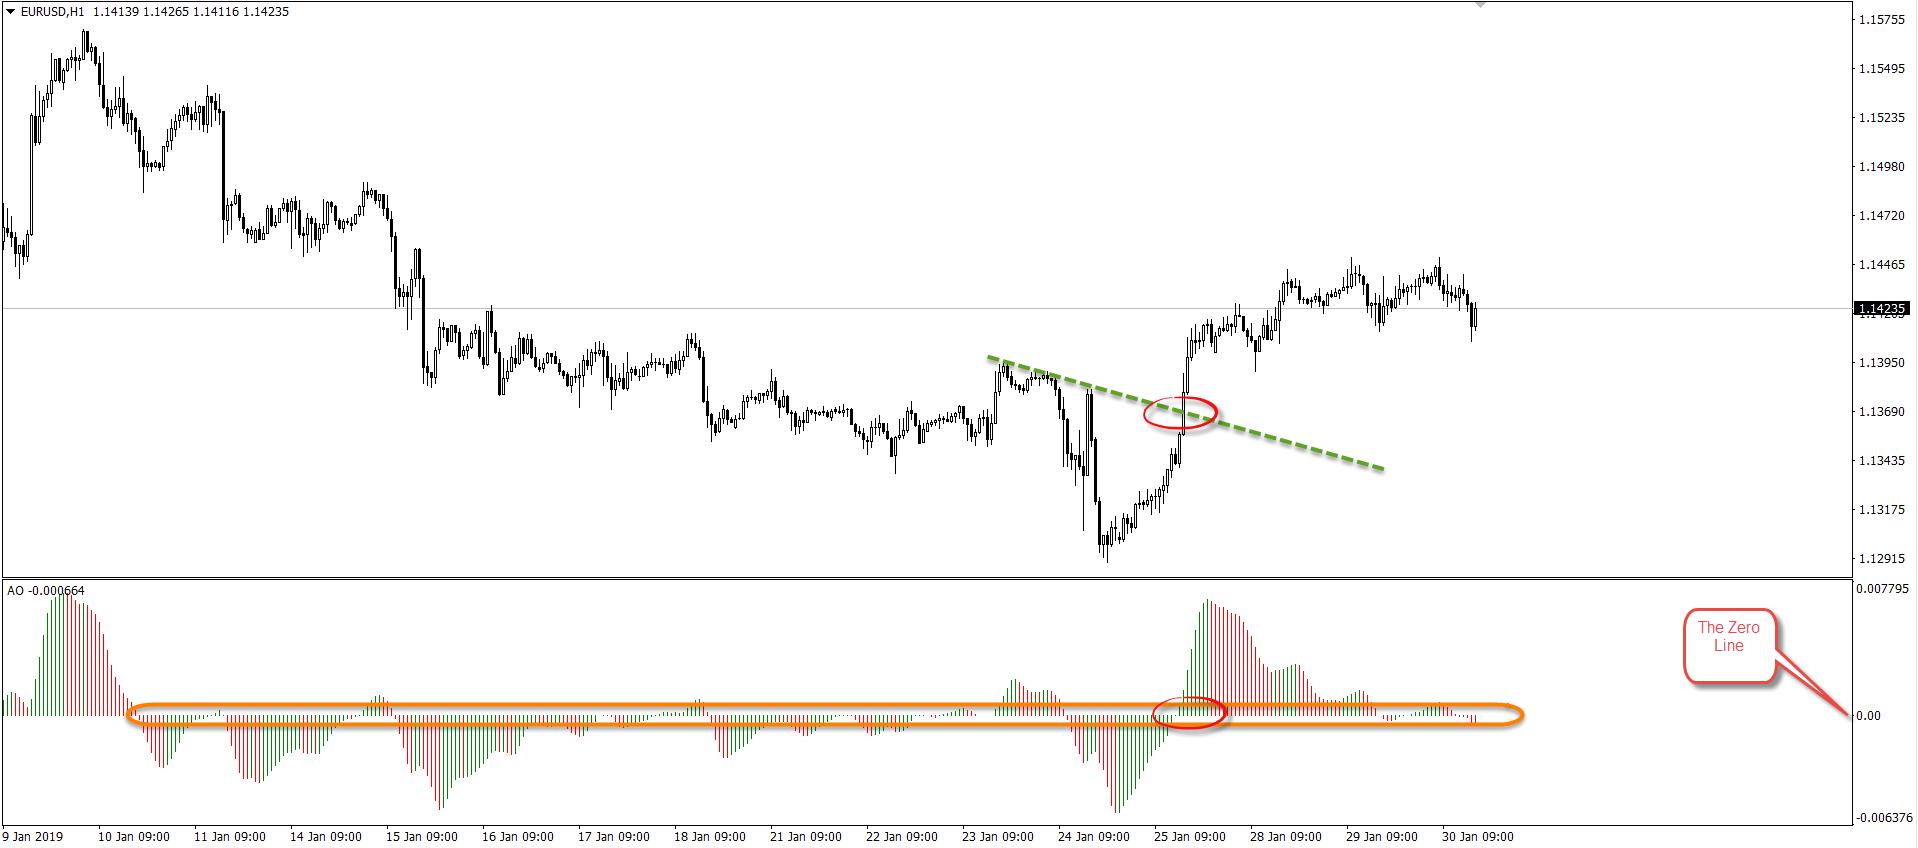 Measure Market Momentum Using the Awesome Oscillator 6